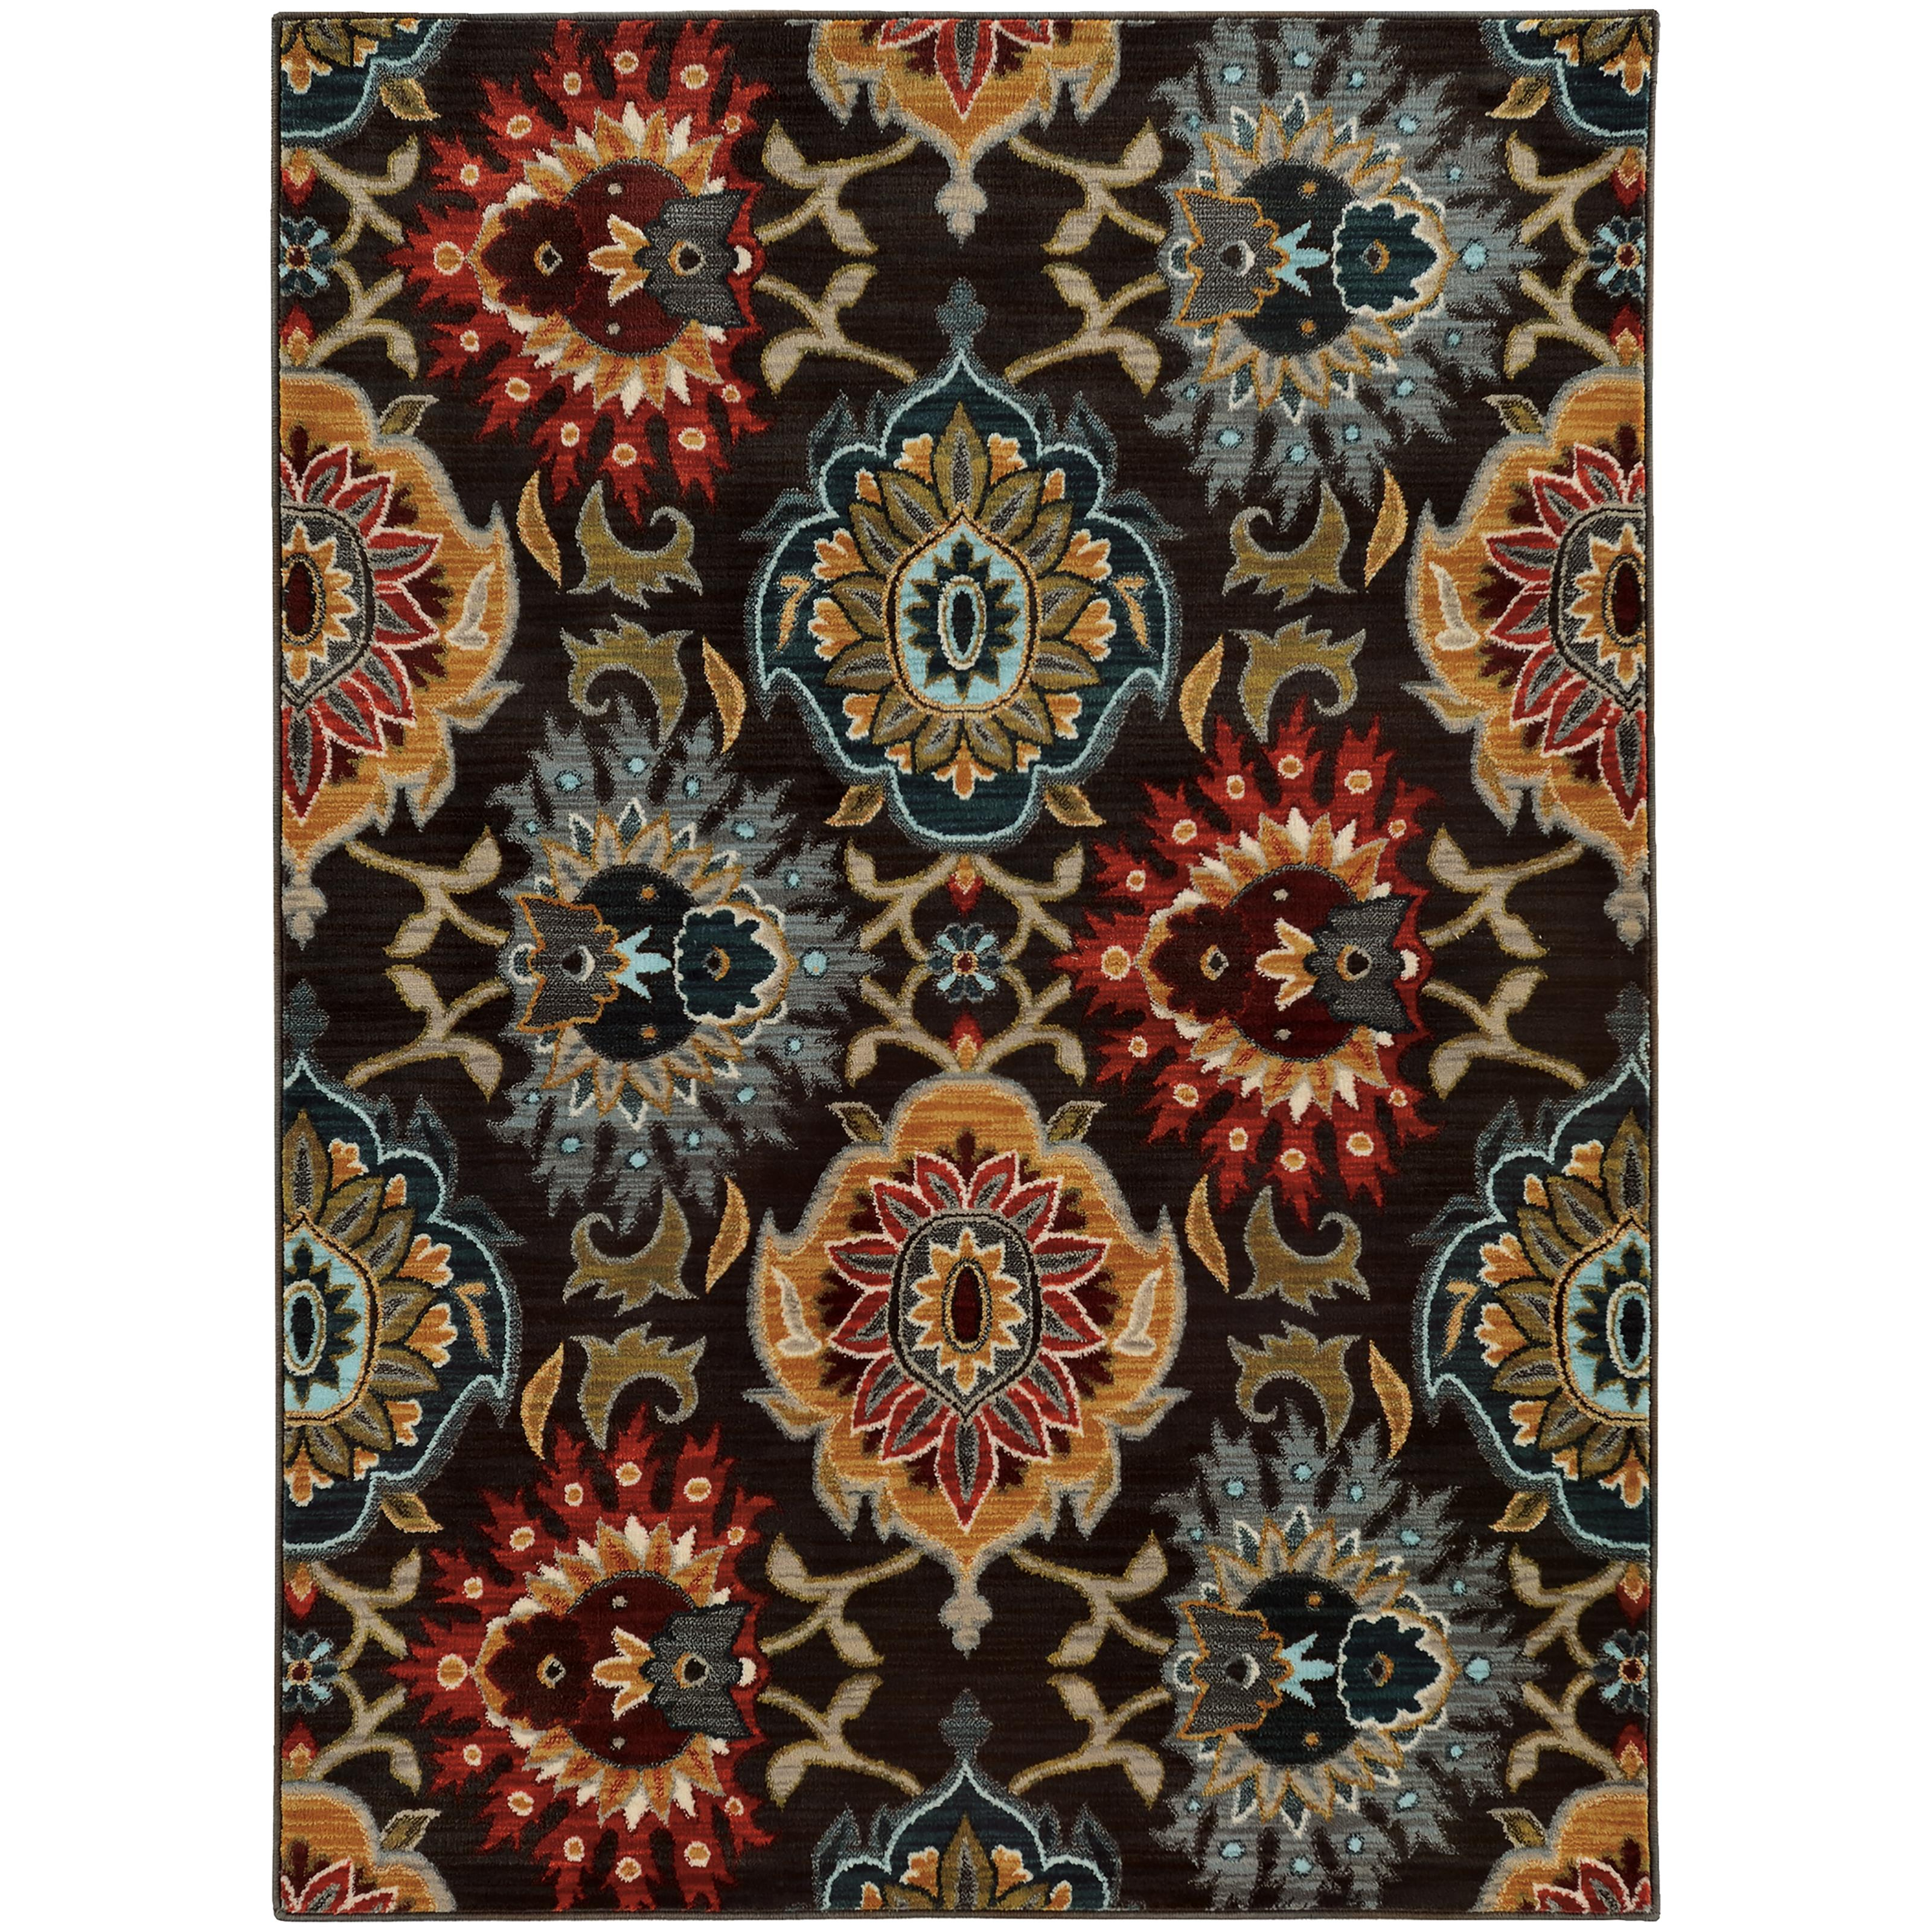 "Sedona 6' 7"" X  9' 6"" Rug by Oriental Weavers at Steger's Furniture"